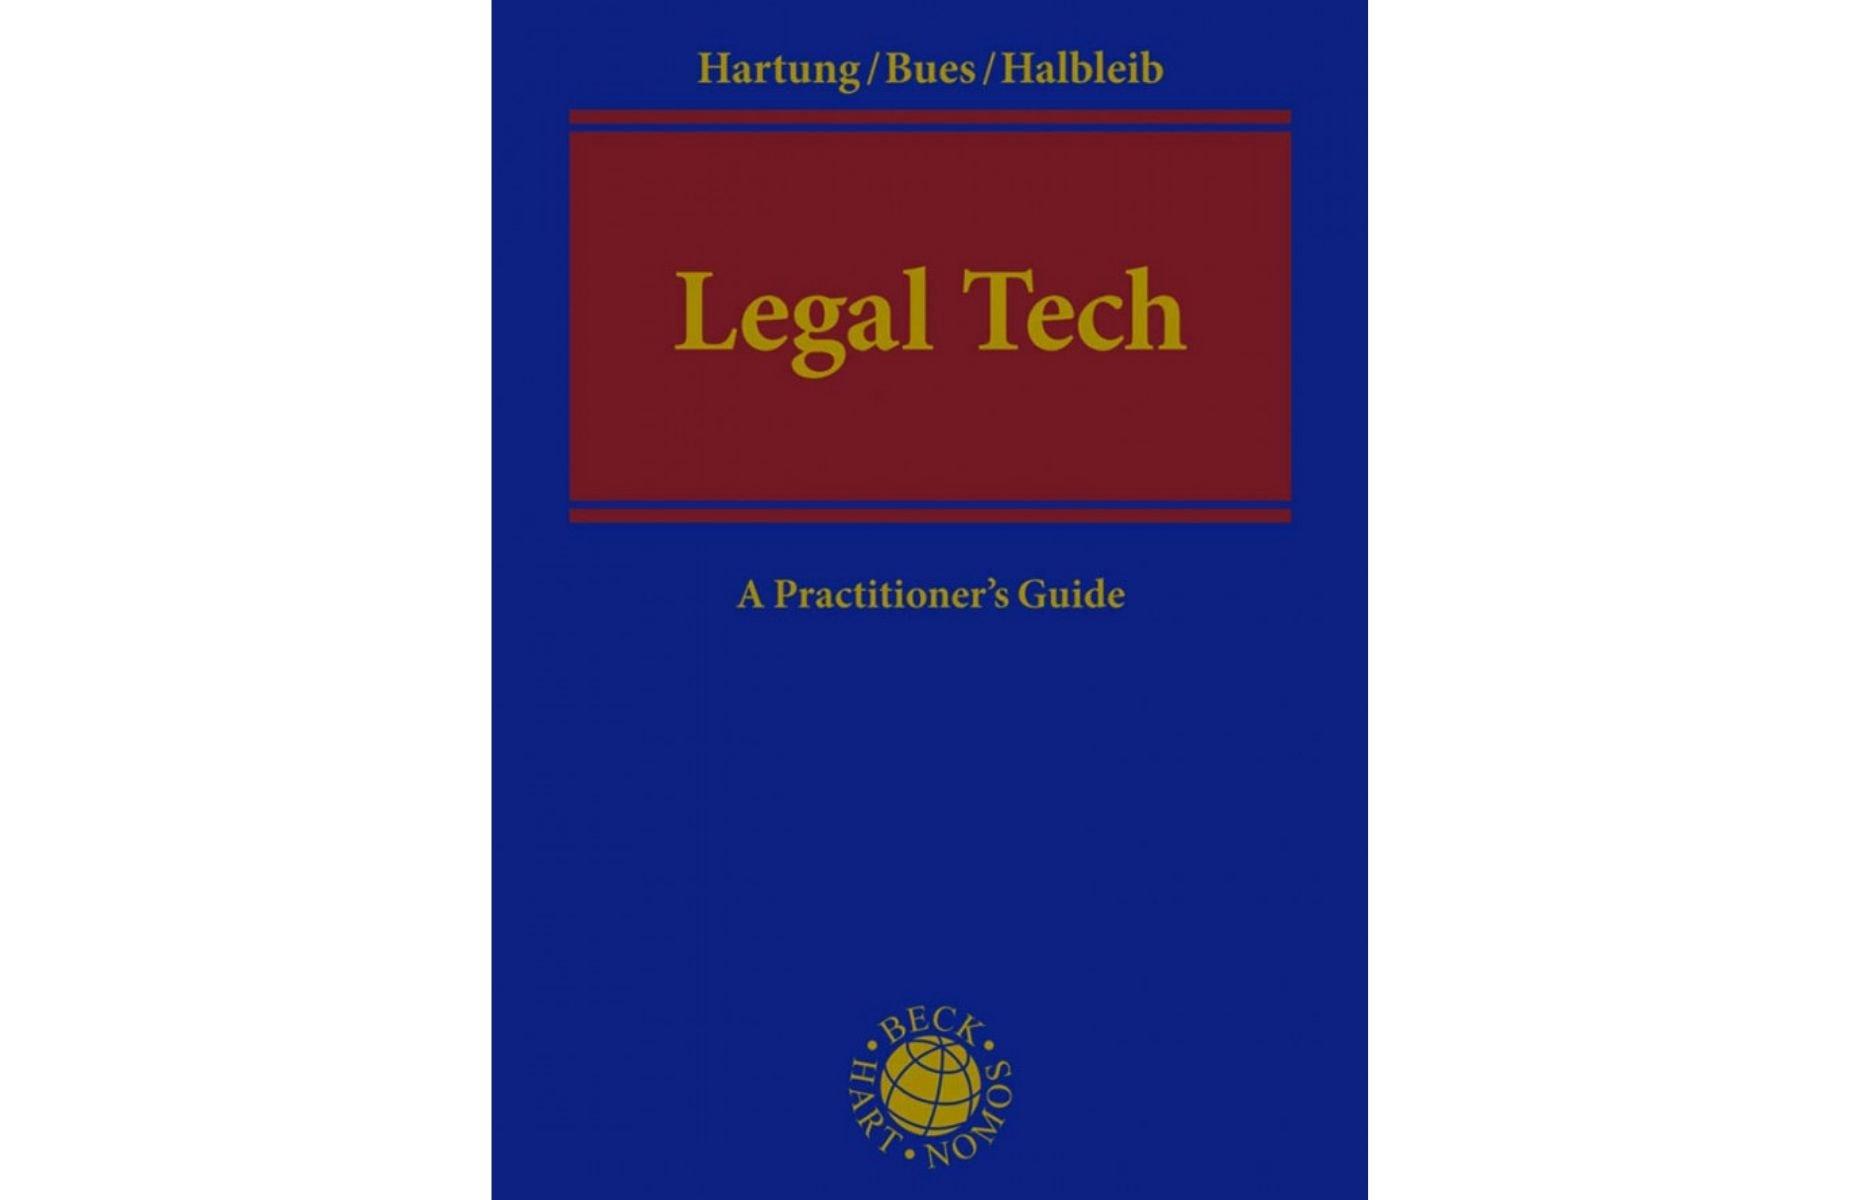 #11 Legal-Tech